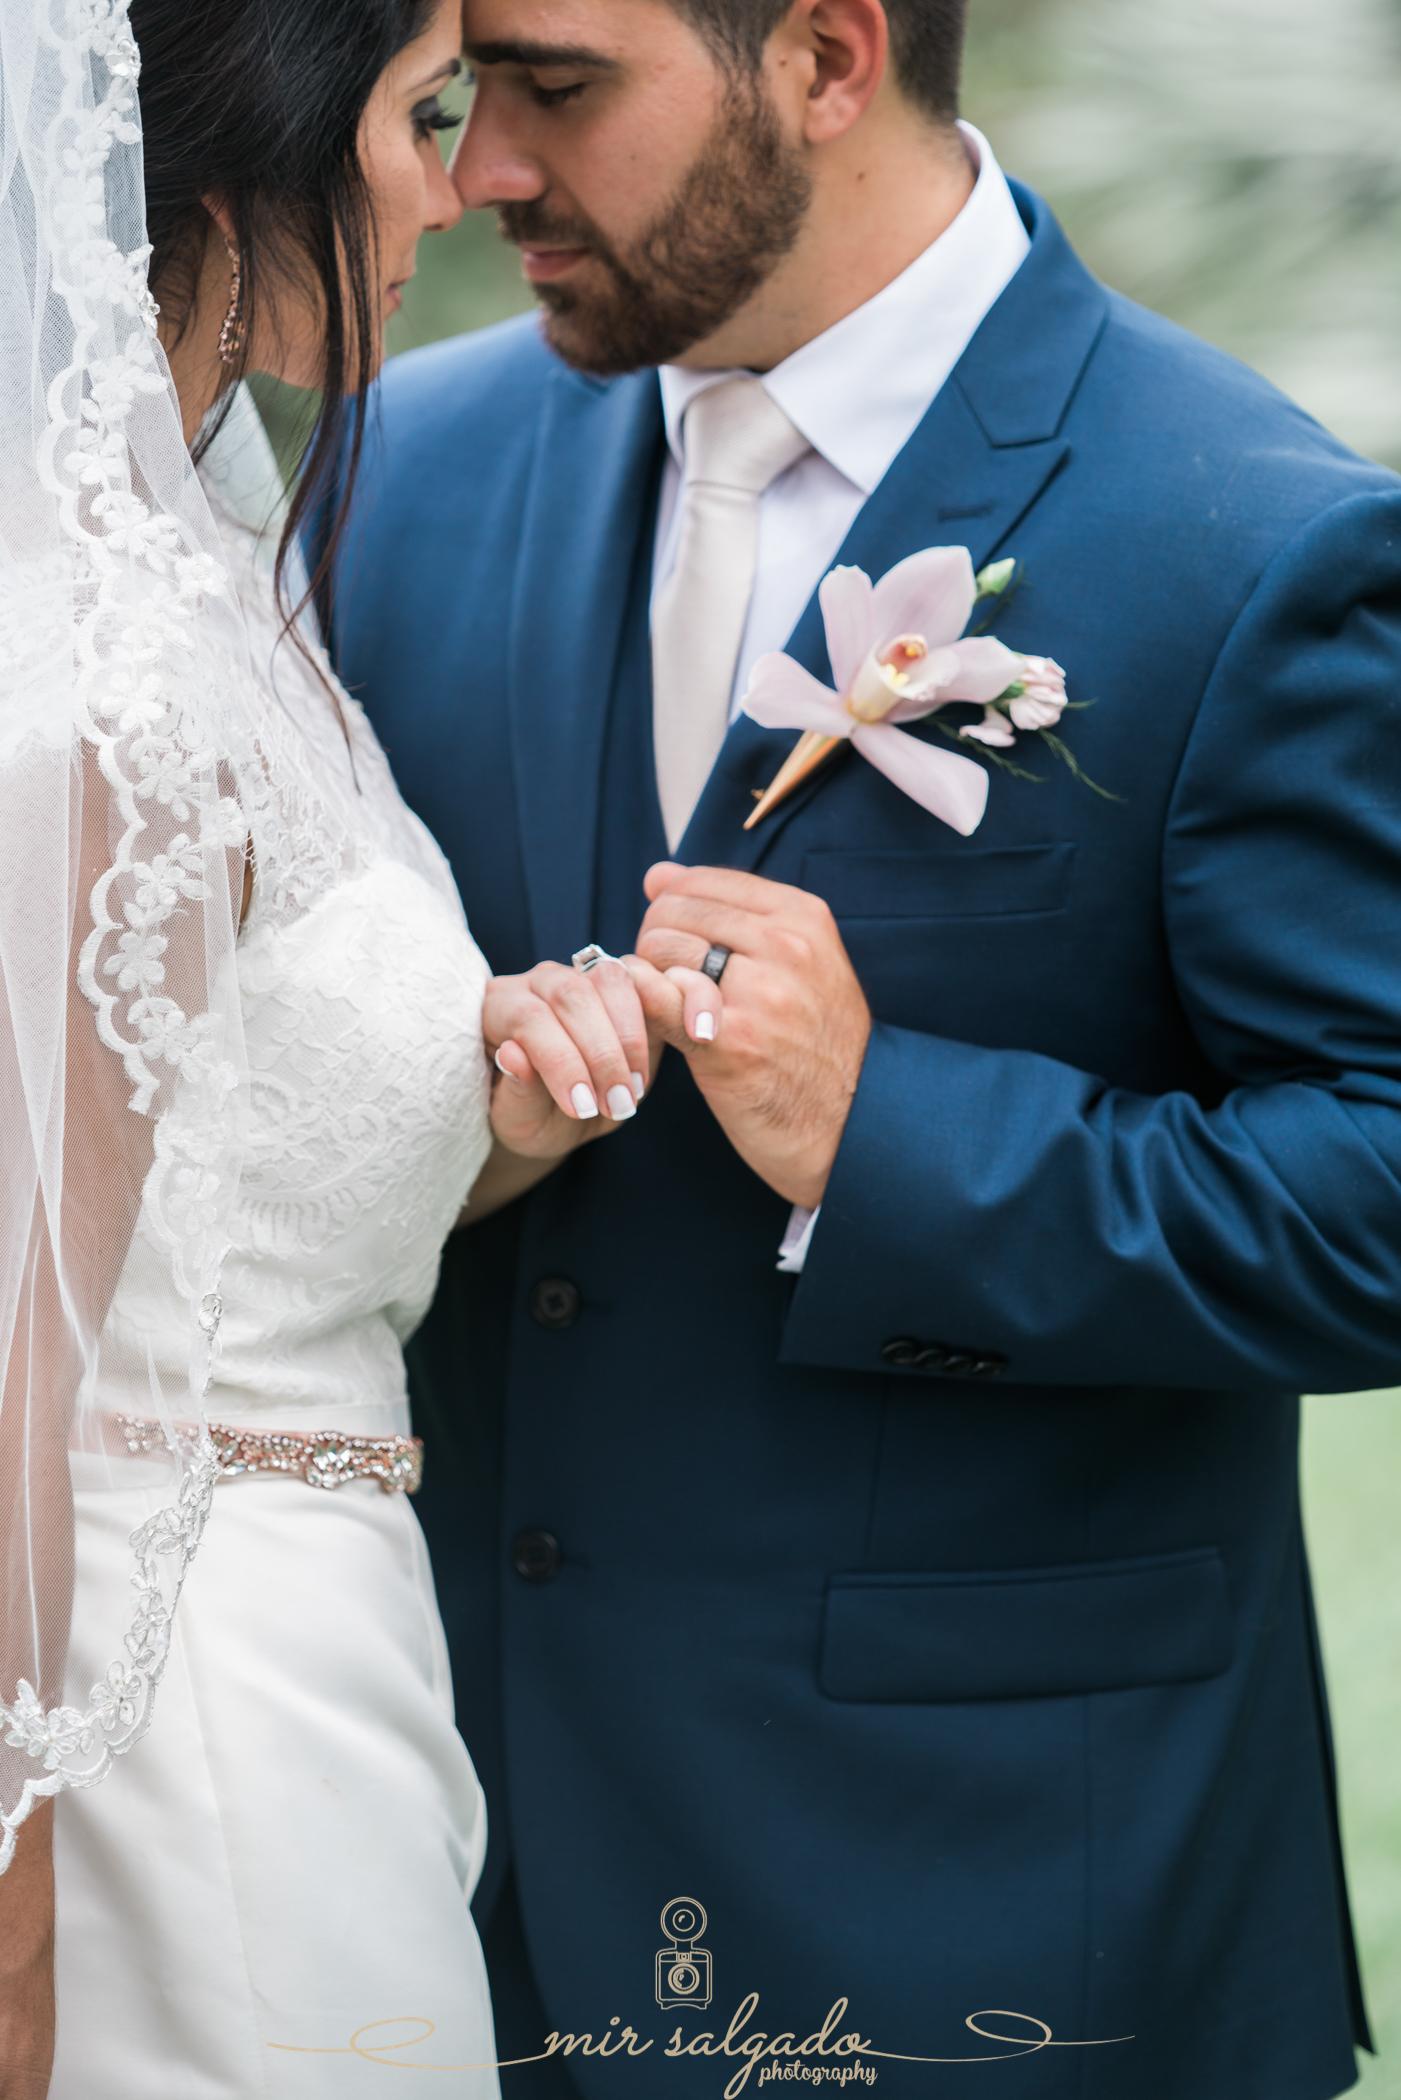 Bride-and-groom-wedding-photo, Florida-garden-wedding-photography, Tampa-wedding